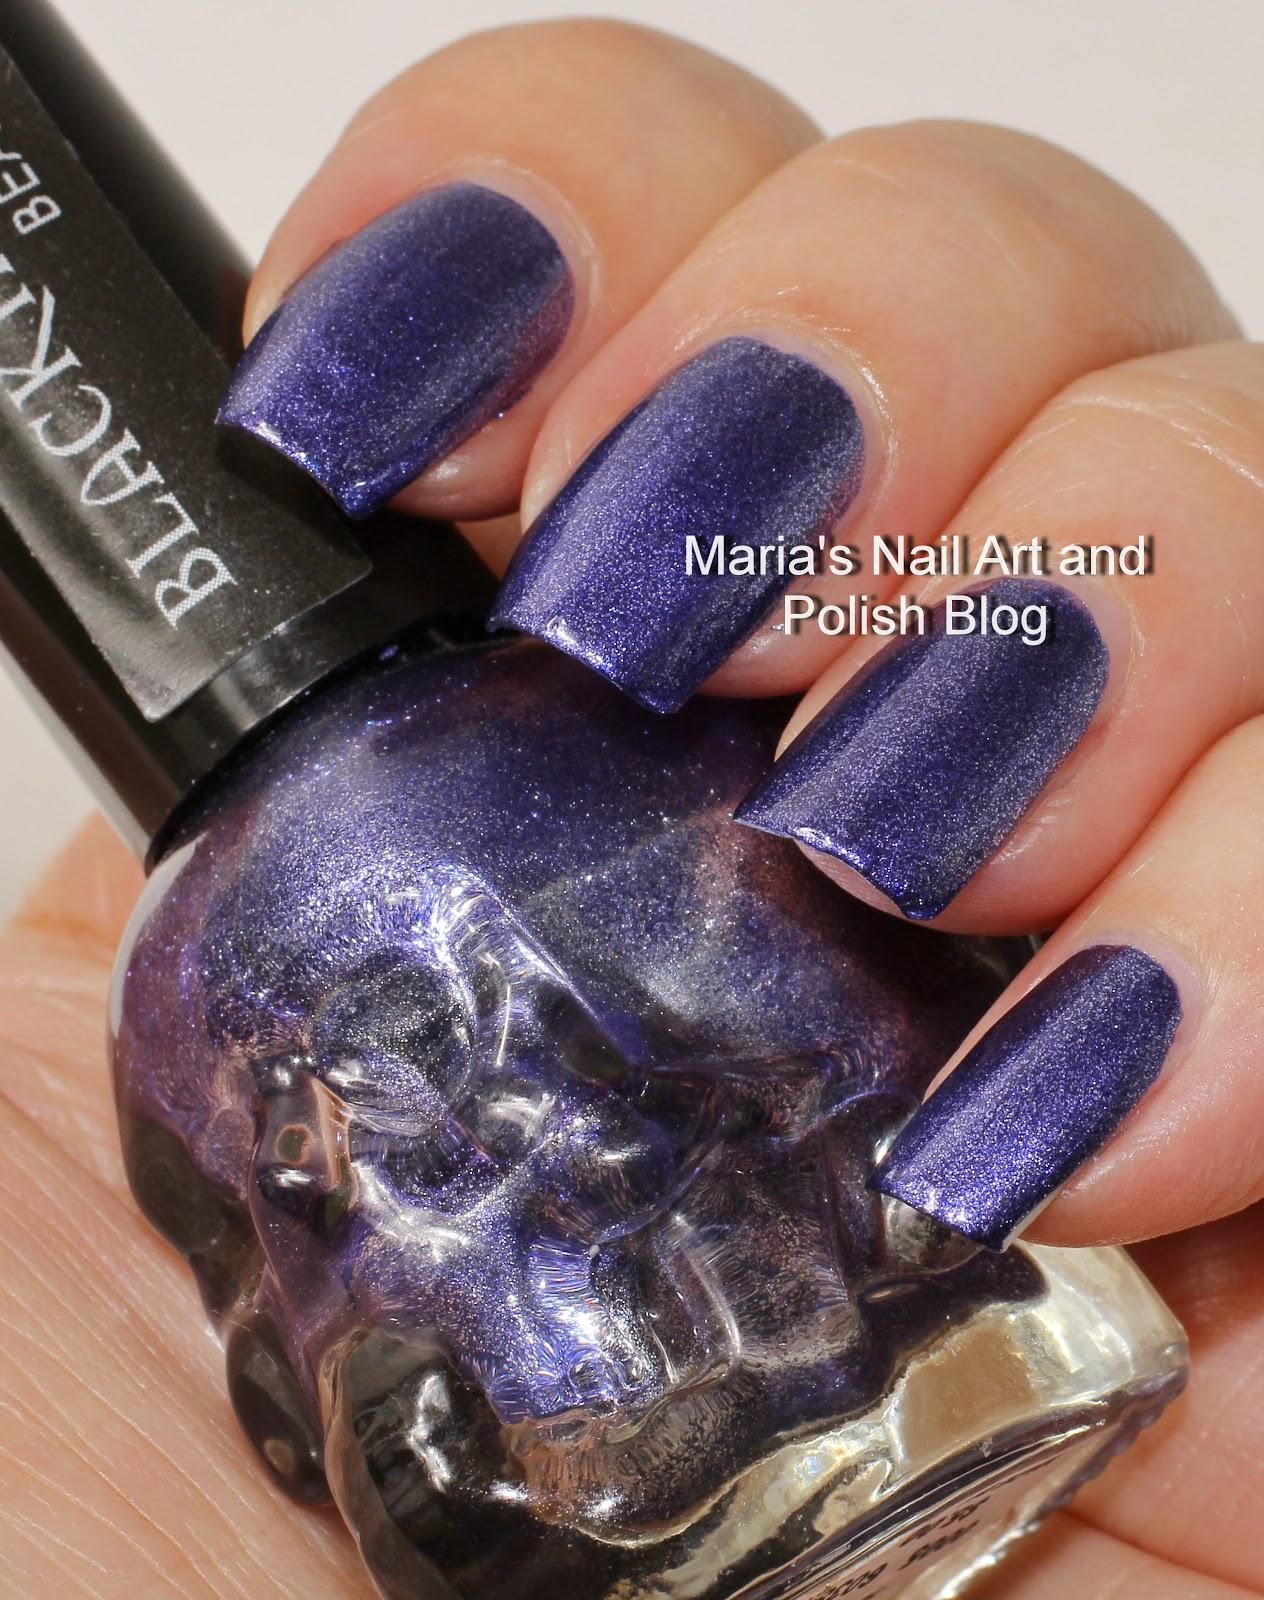 Marias Nail Art and Polish Blog: Black Heart swatch spam